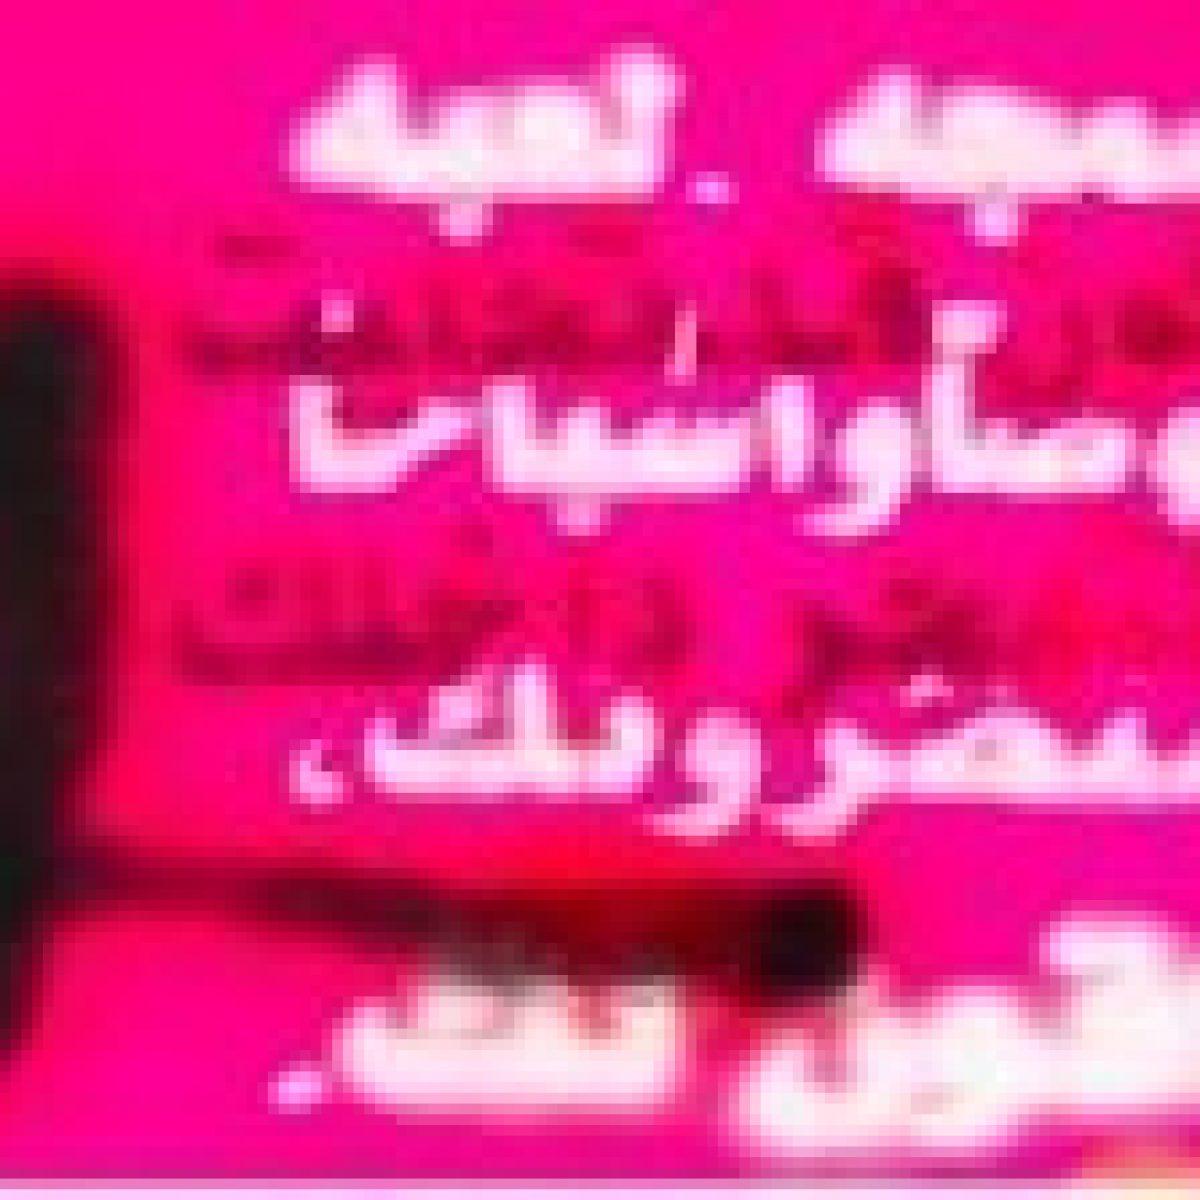 Hussein Al-Mohasen